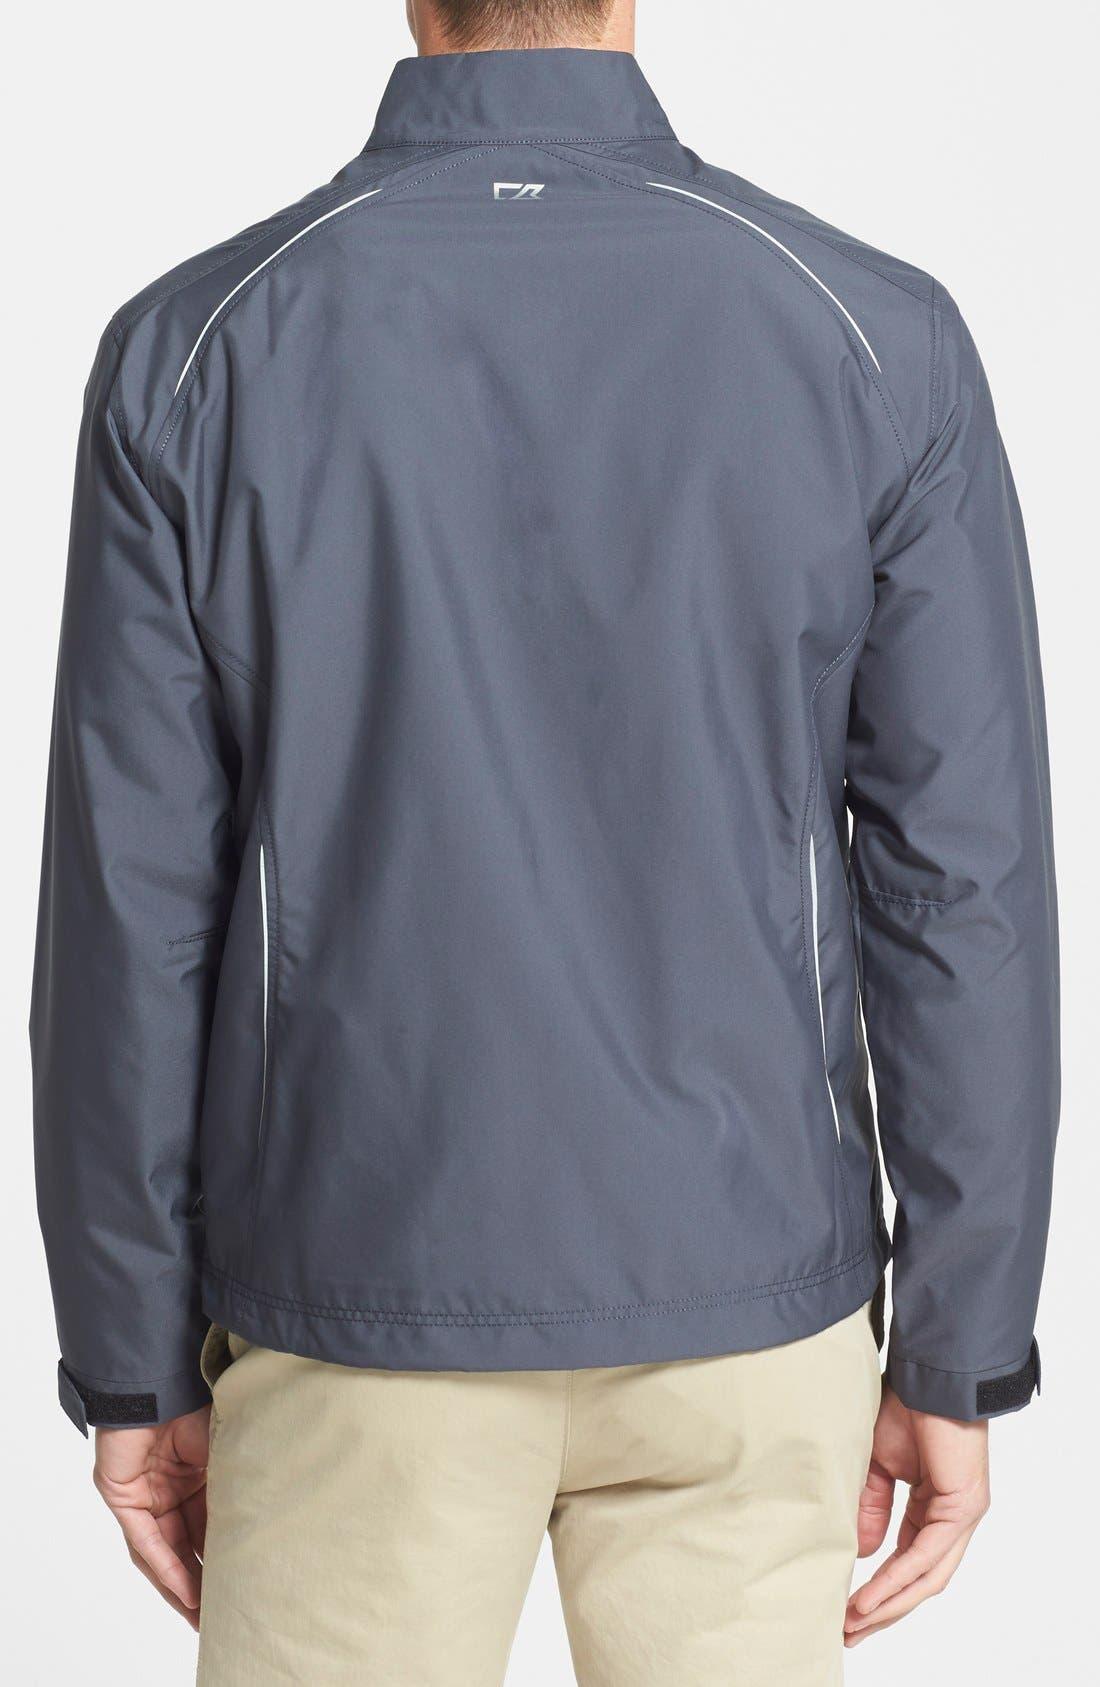 Alternate Image 2  - Cutter & Buck Beacon WeatherTec Wind & Water Resistant Jacket